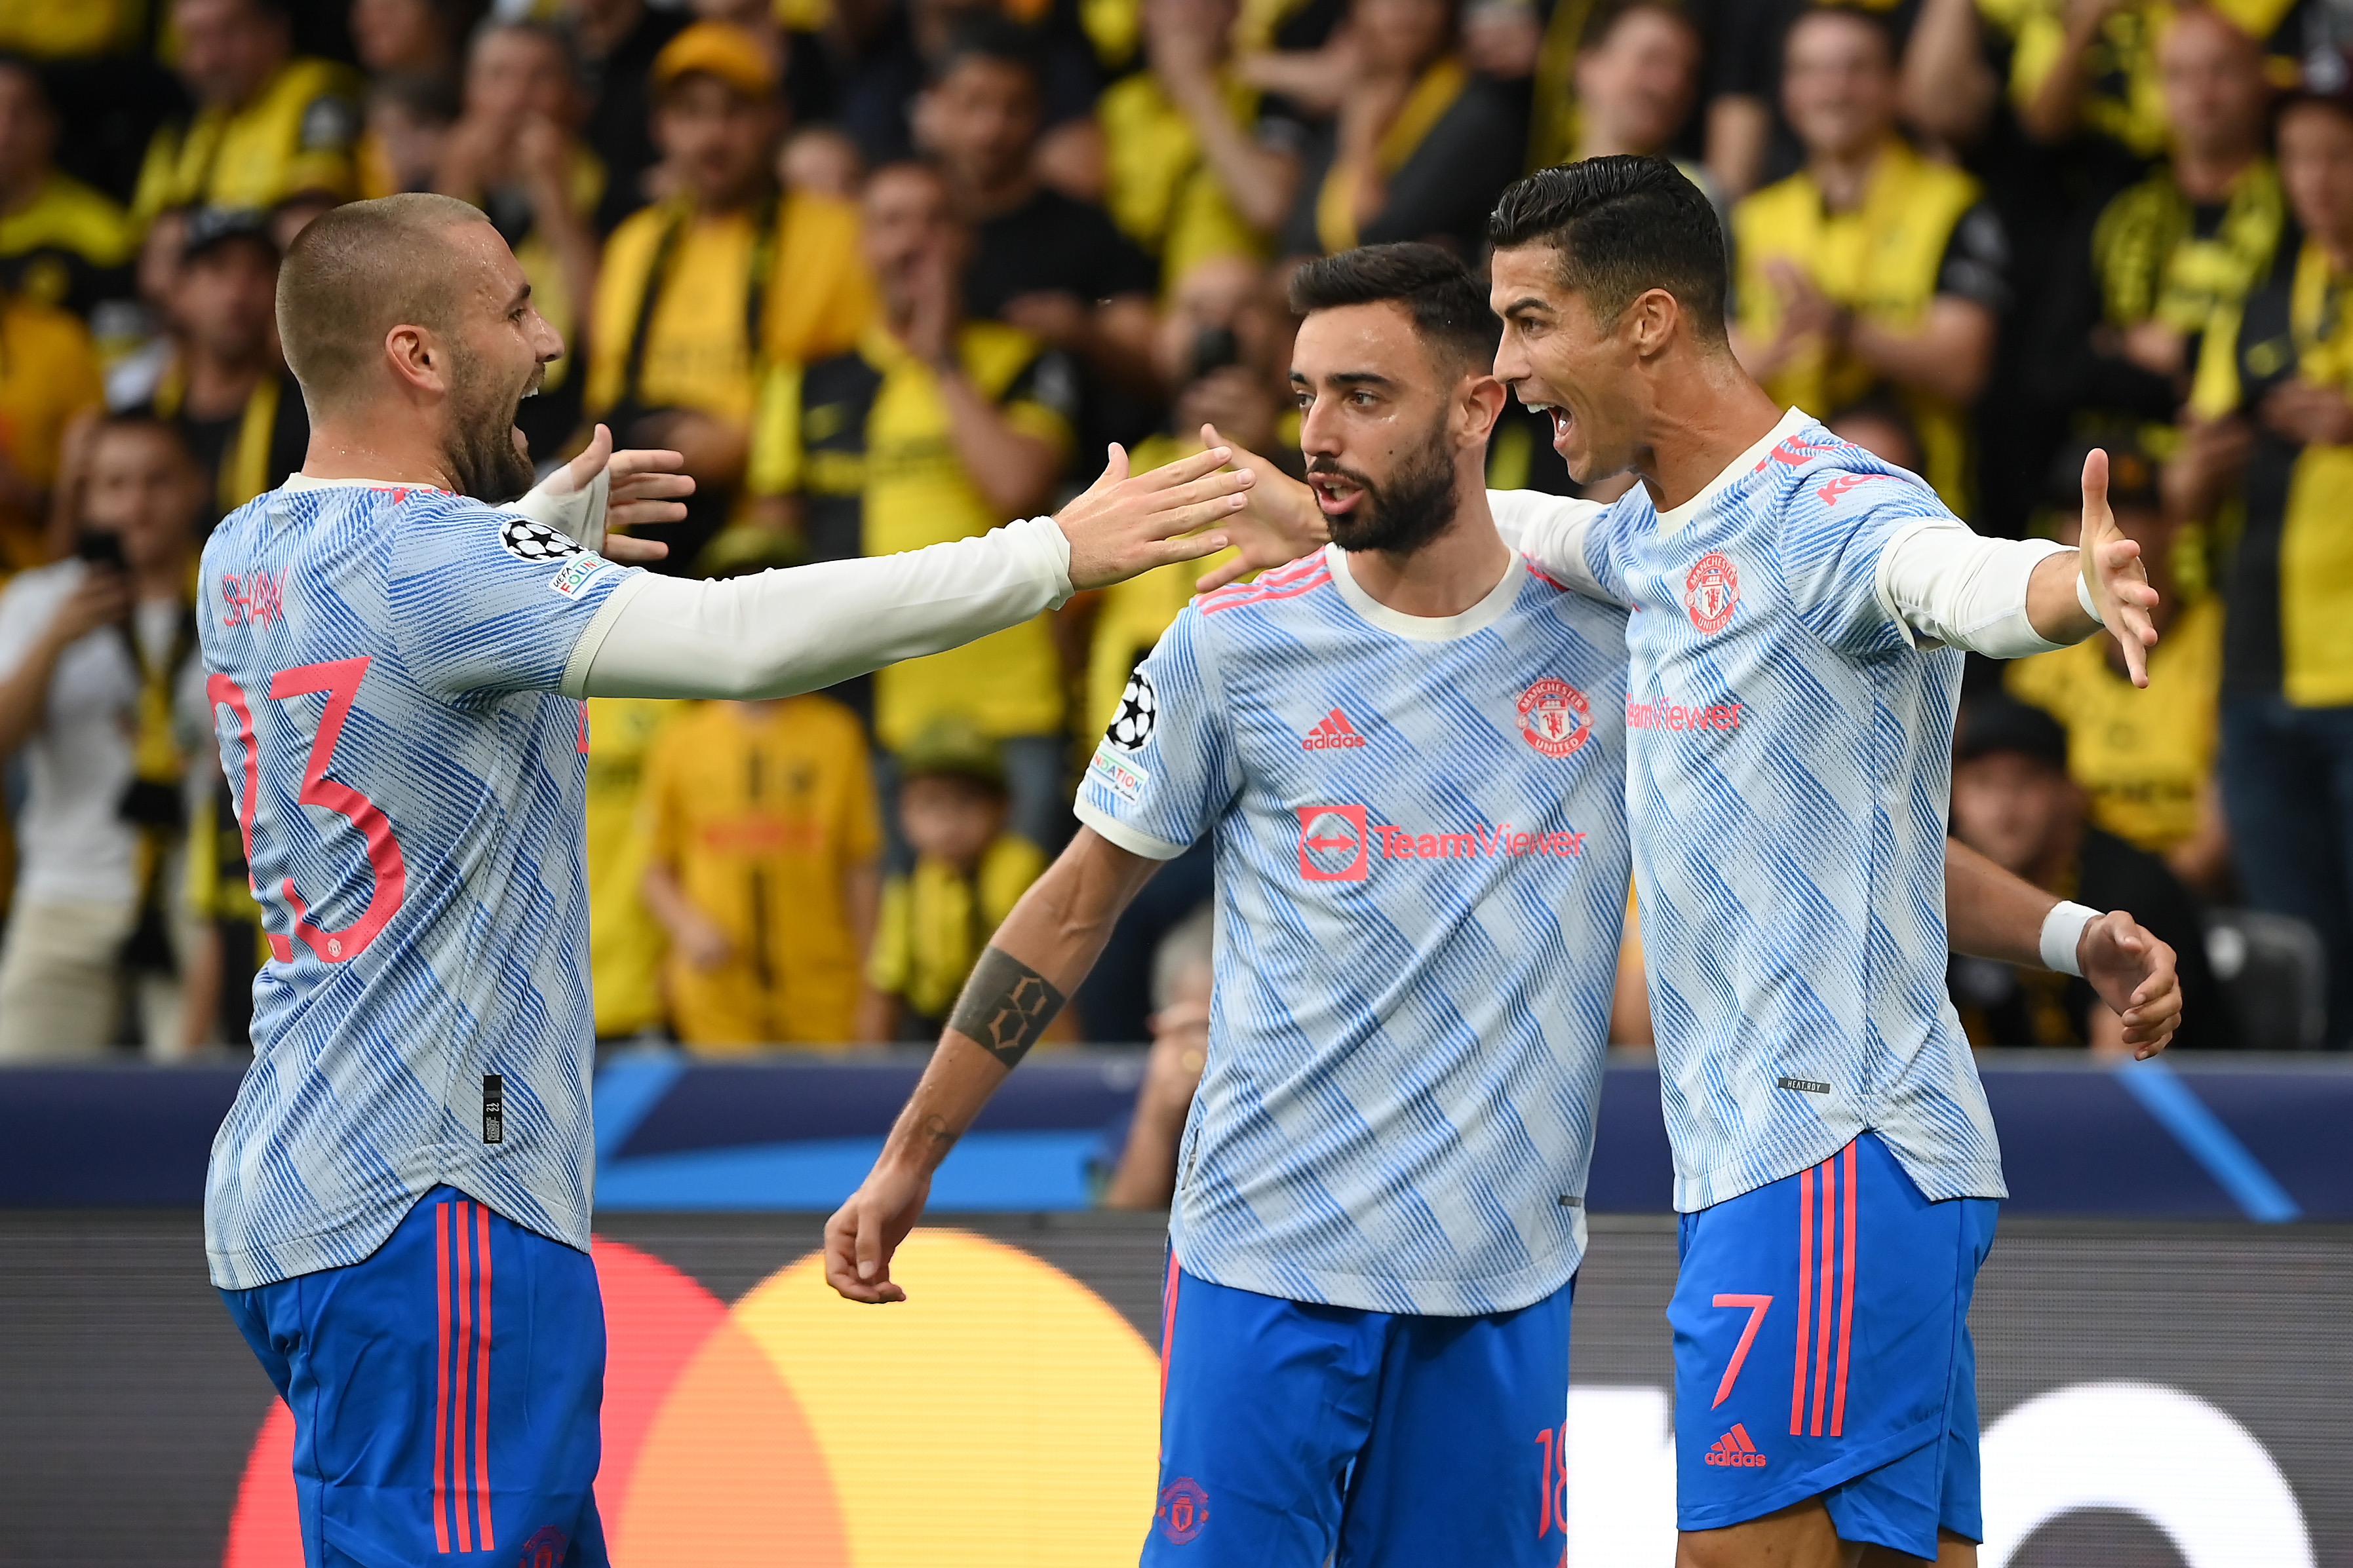 Ronaldo celebrates with Manchester United players